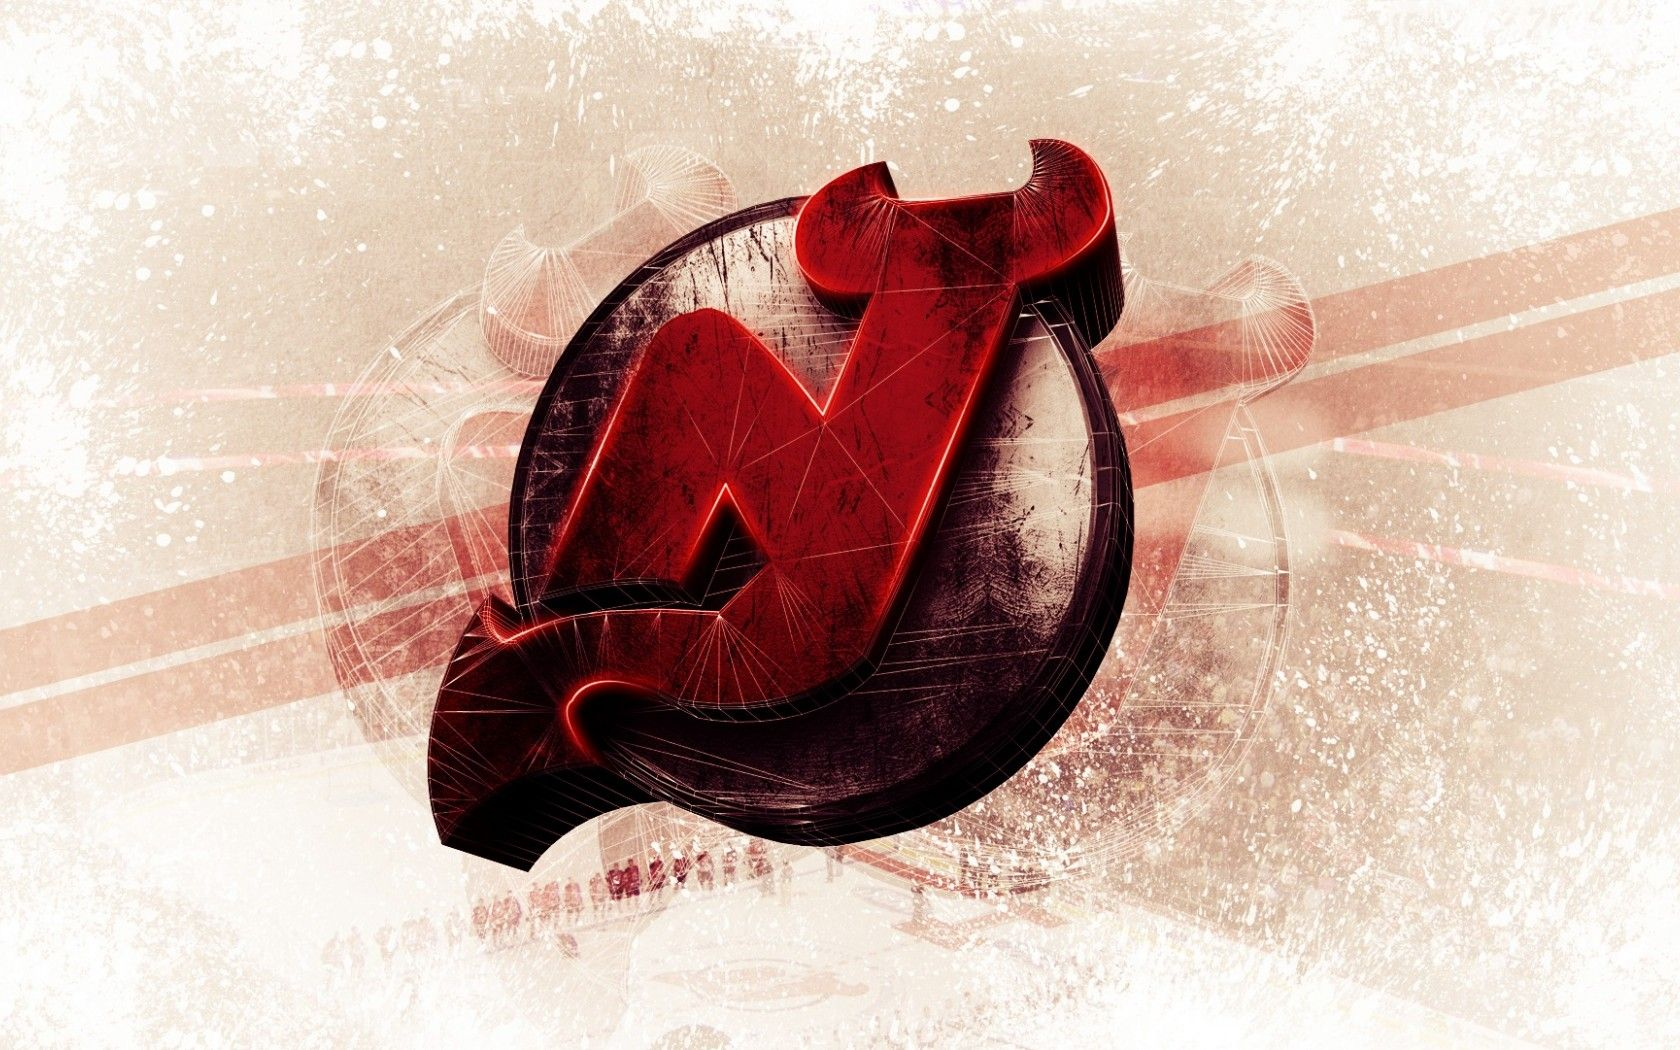 new jersey devils wallpaper iphone - Google Search | Hockey | New Jersey Devils, Devil, New Jersey